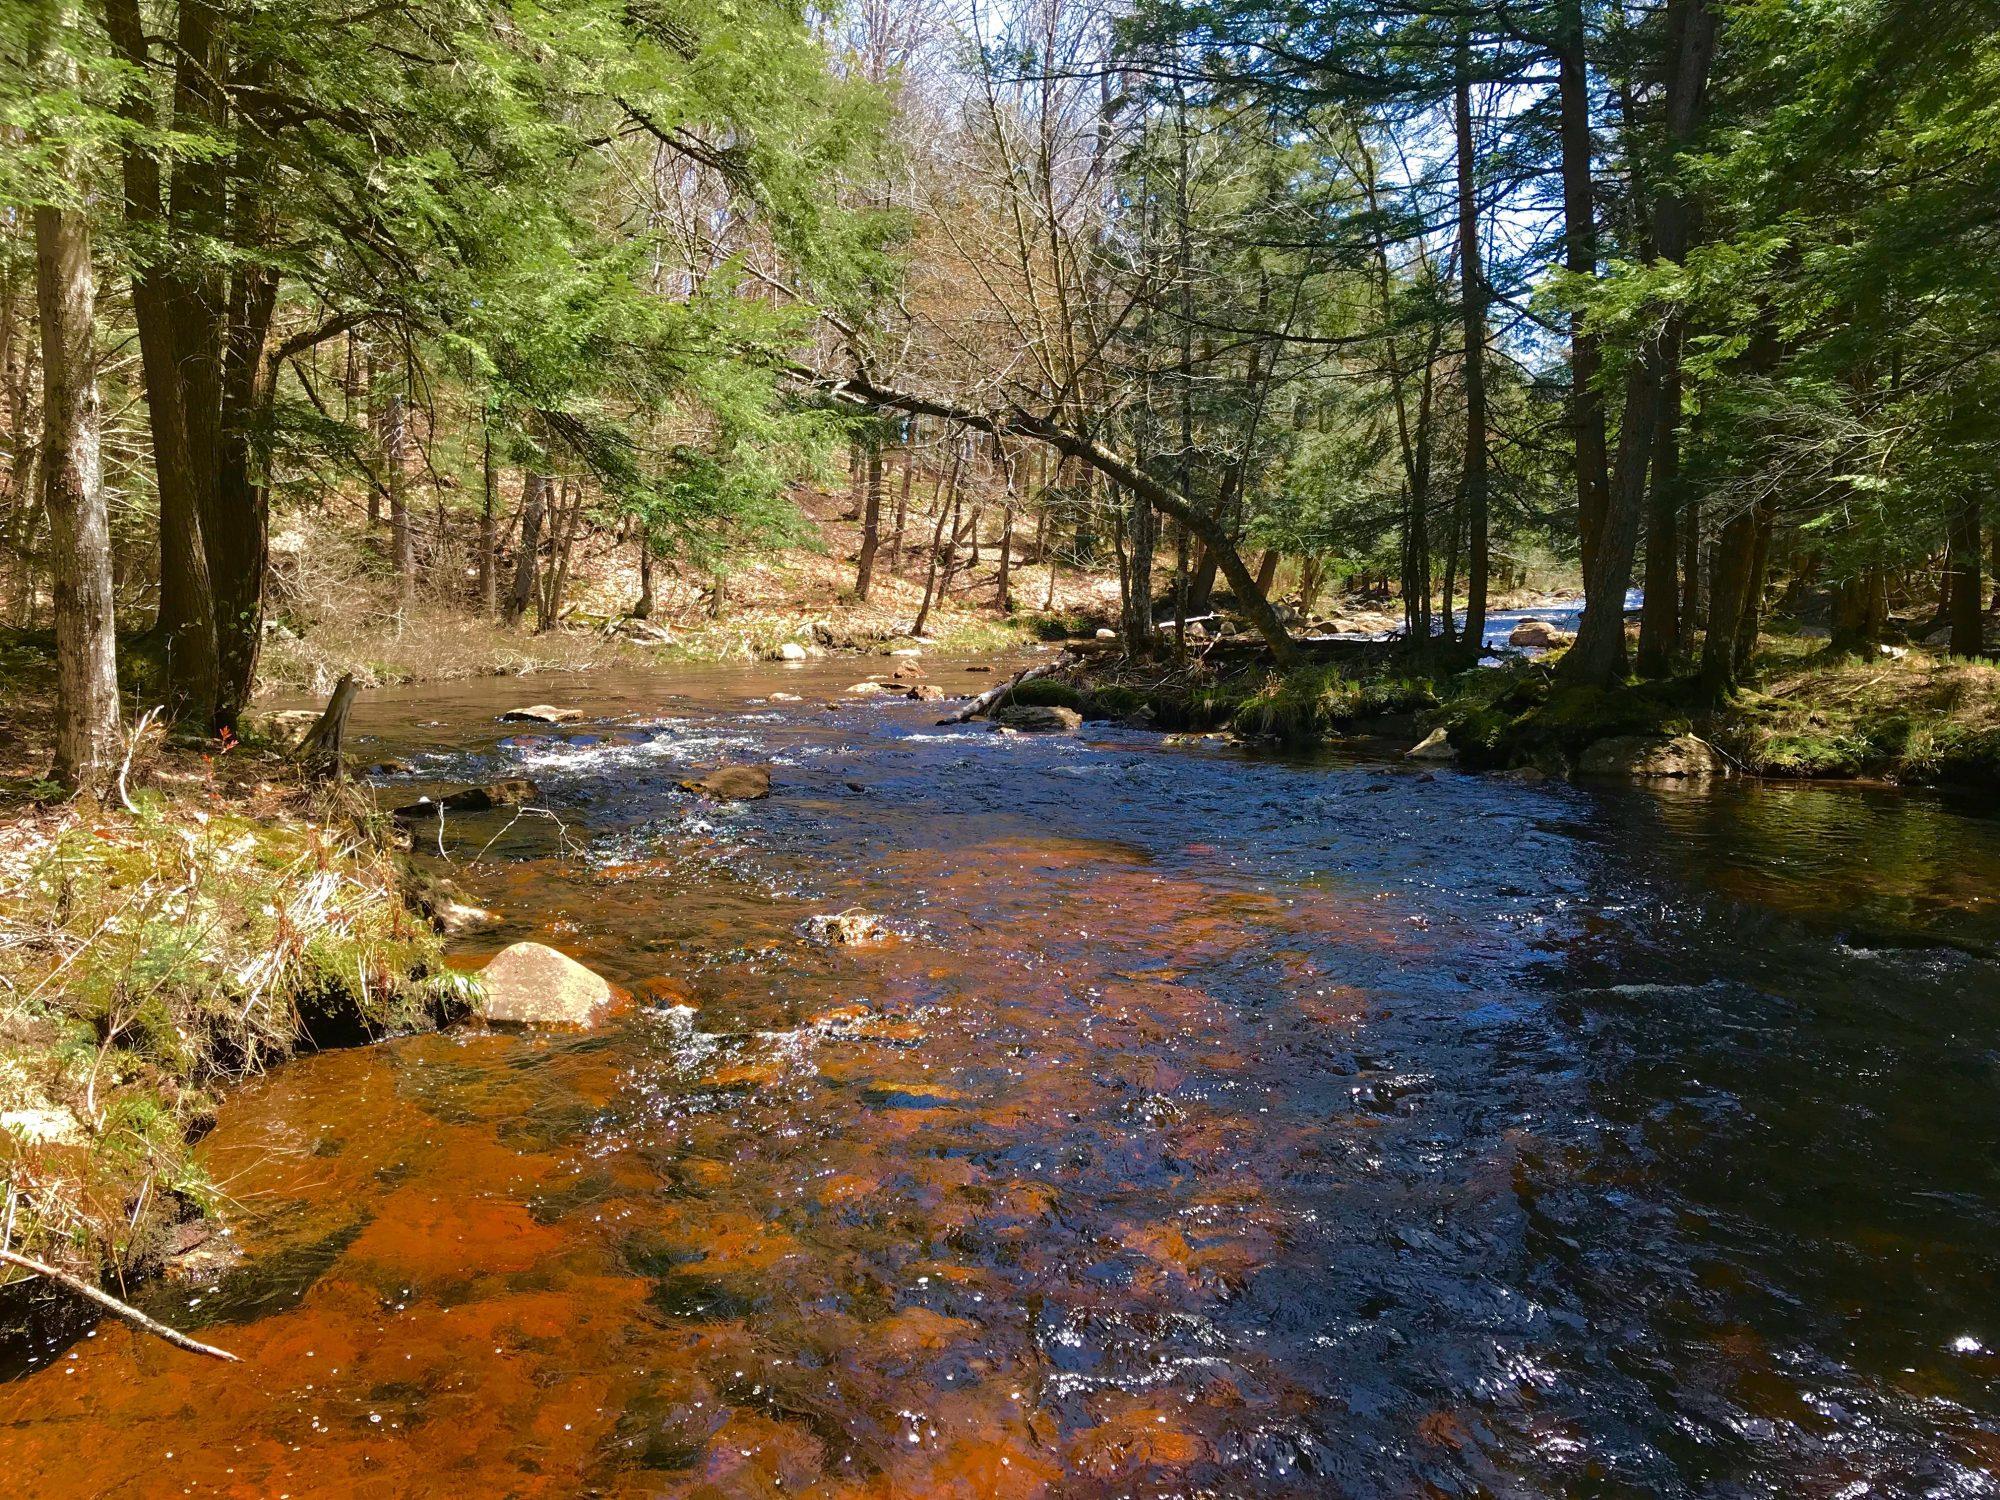 Adirondack Riverfront Properties in Upstate New York